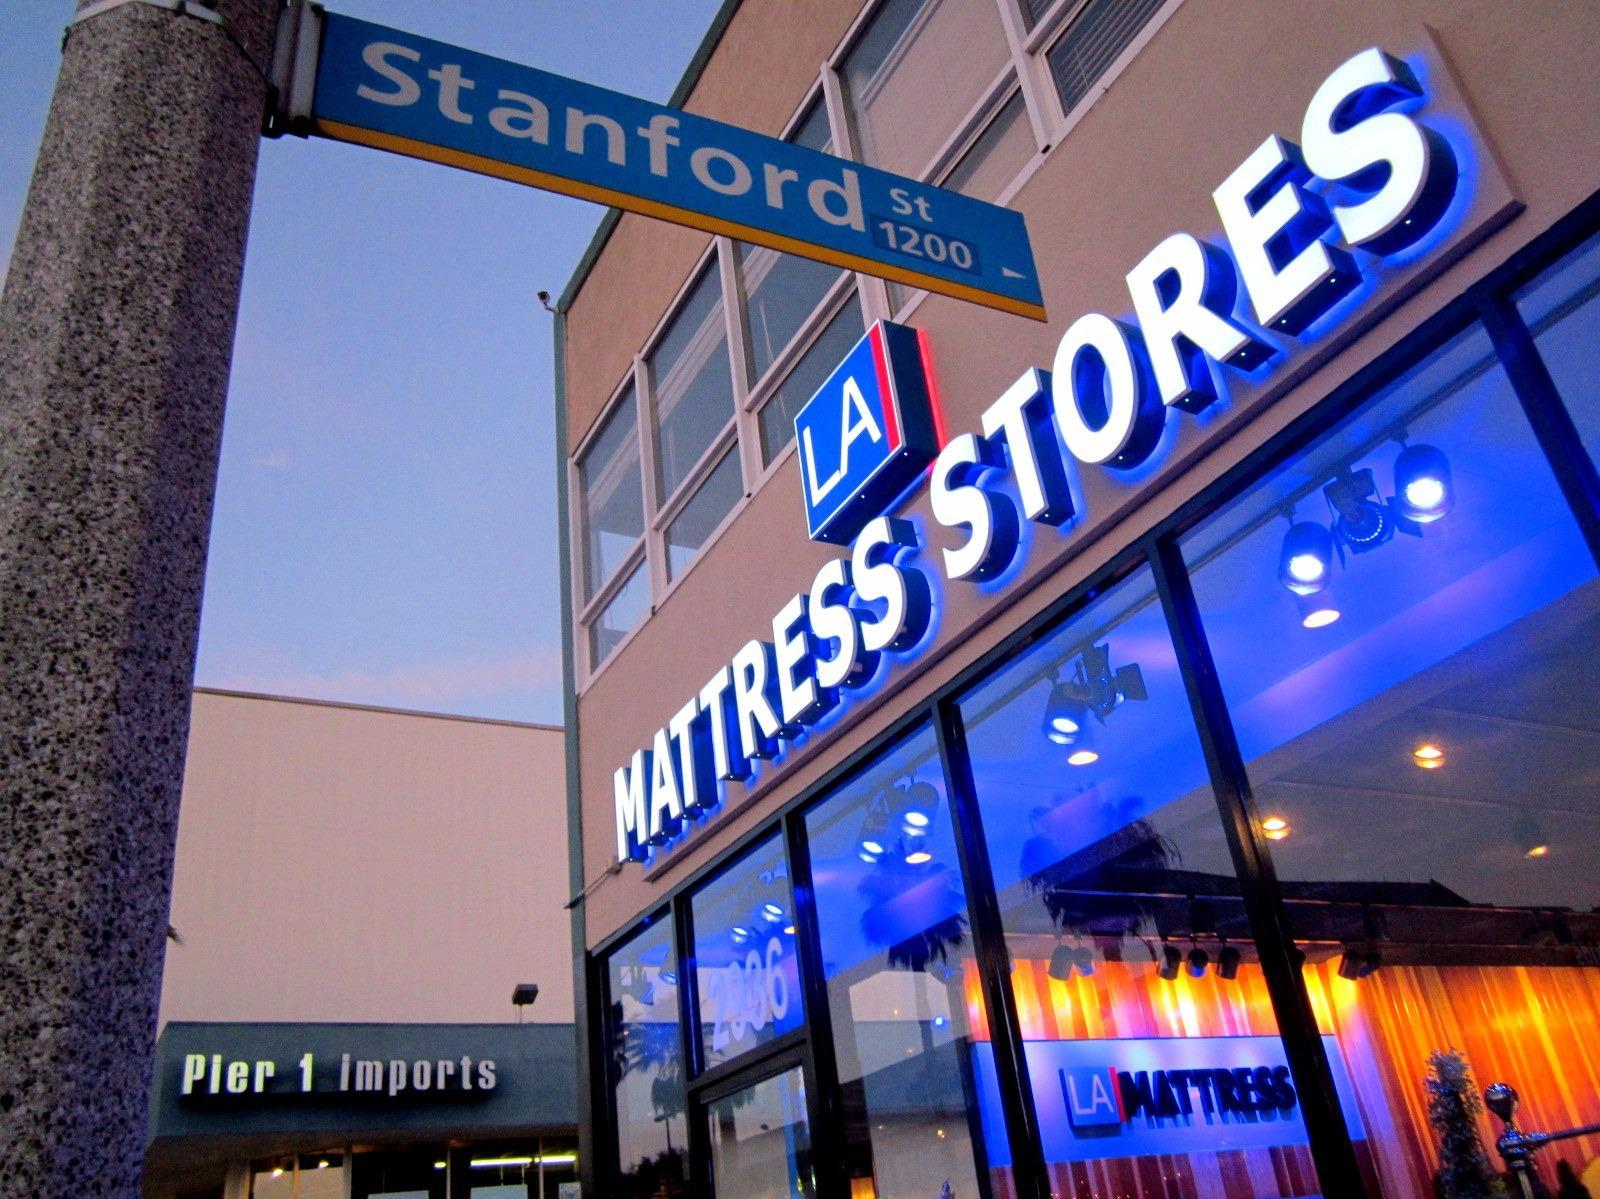 Los Angeles Mattress Stores Santa Monica California Ca